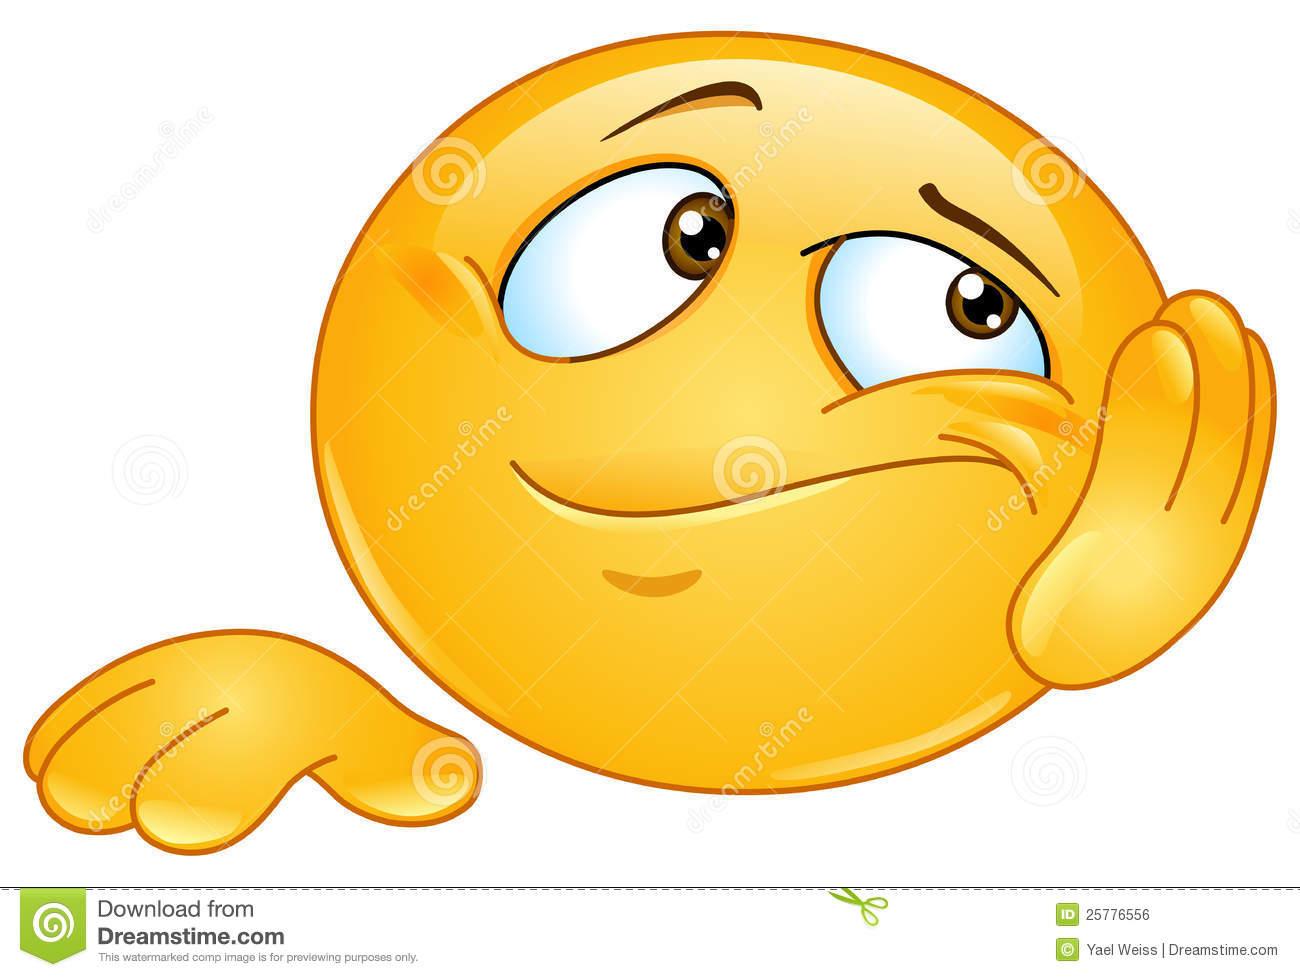 Bored Emoticons Clipart-Bored Emoticons Clipart-0